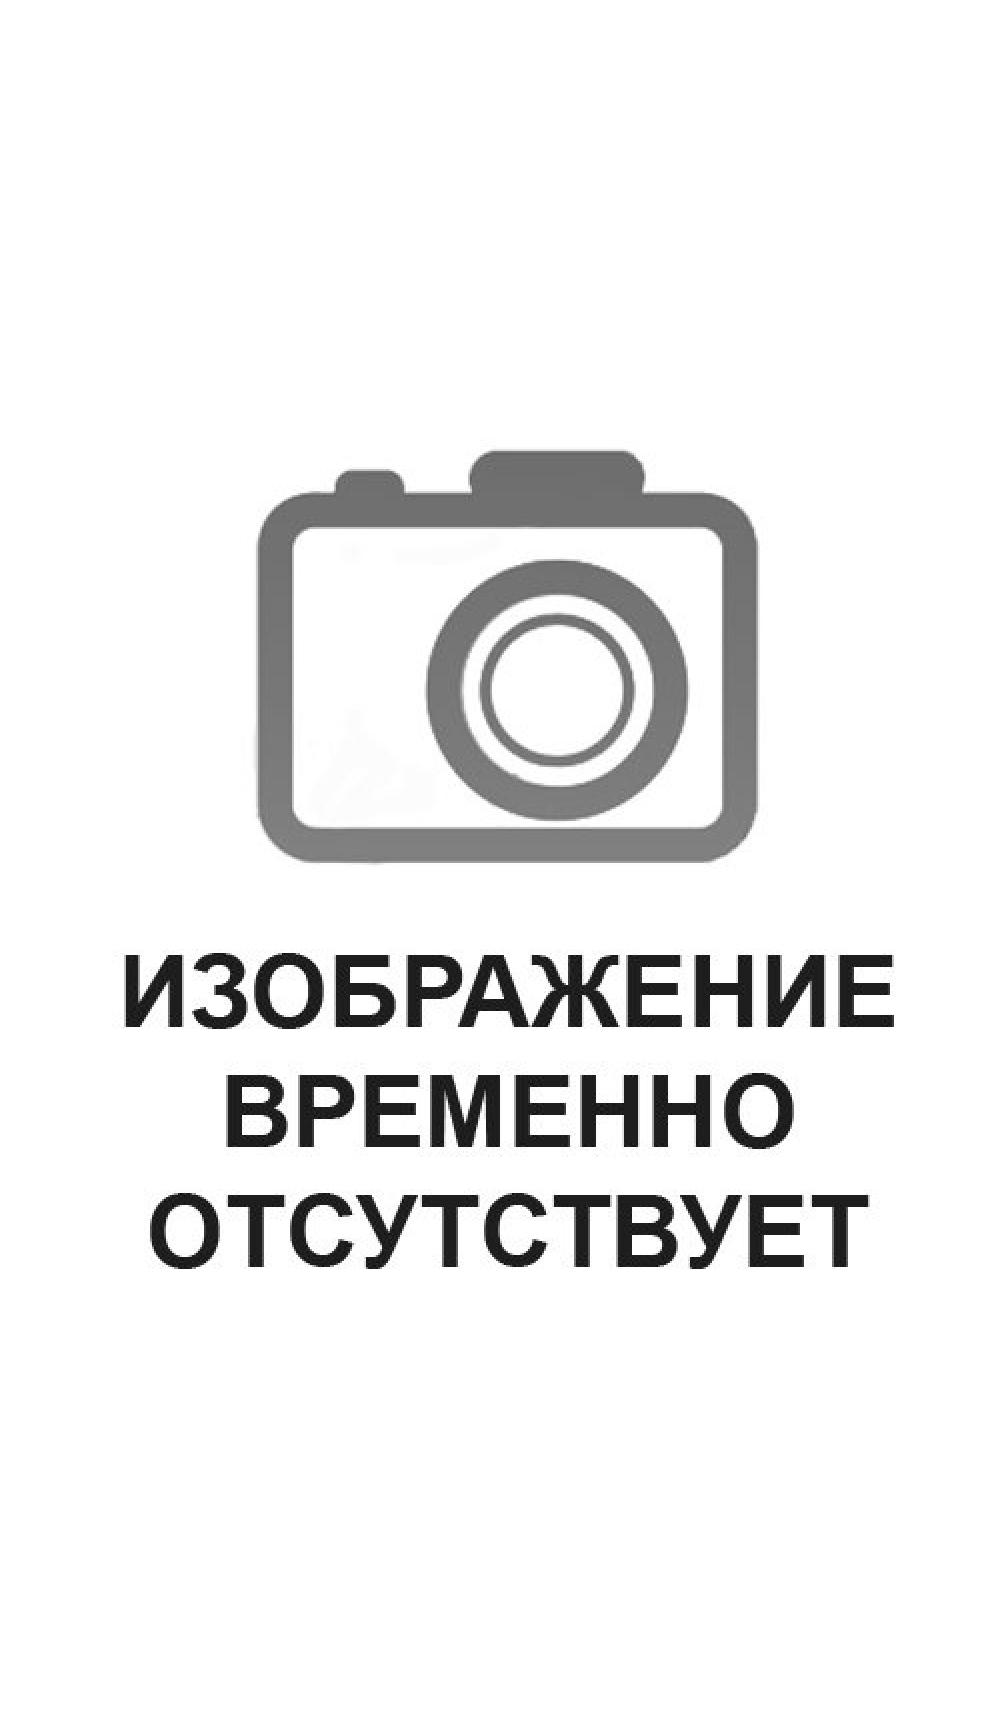 Шапка REVERT Фиалка Didriksons — фото 1